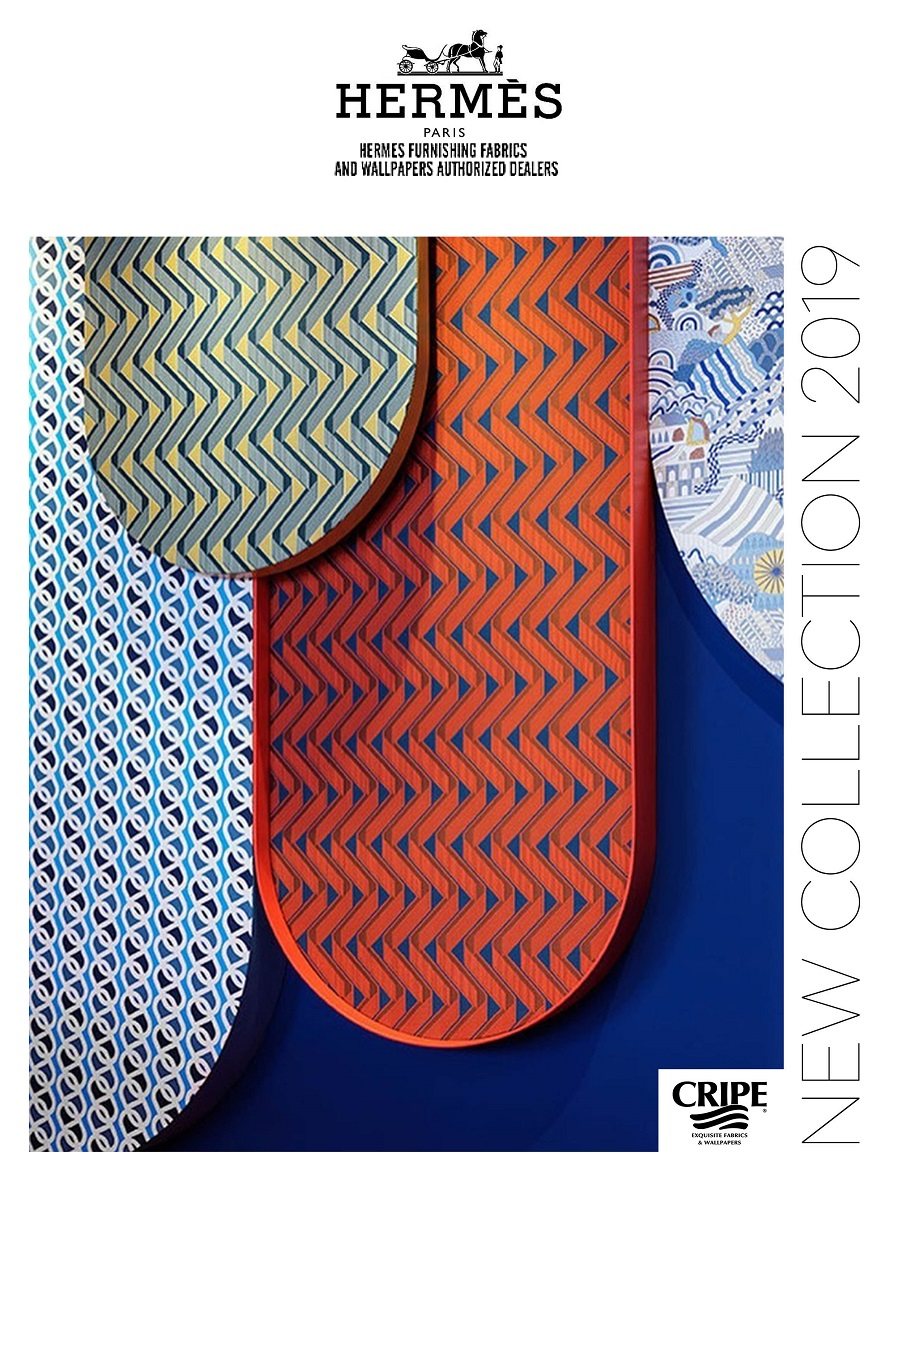 CRIPE PRESENTATION-HERMES-COLLECTION 2019-15